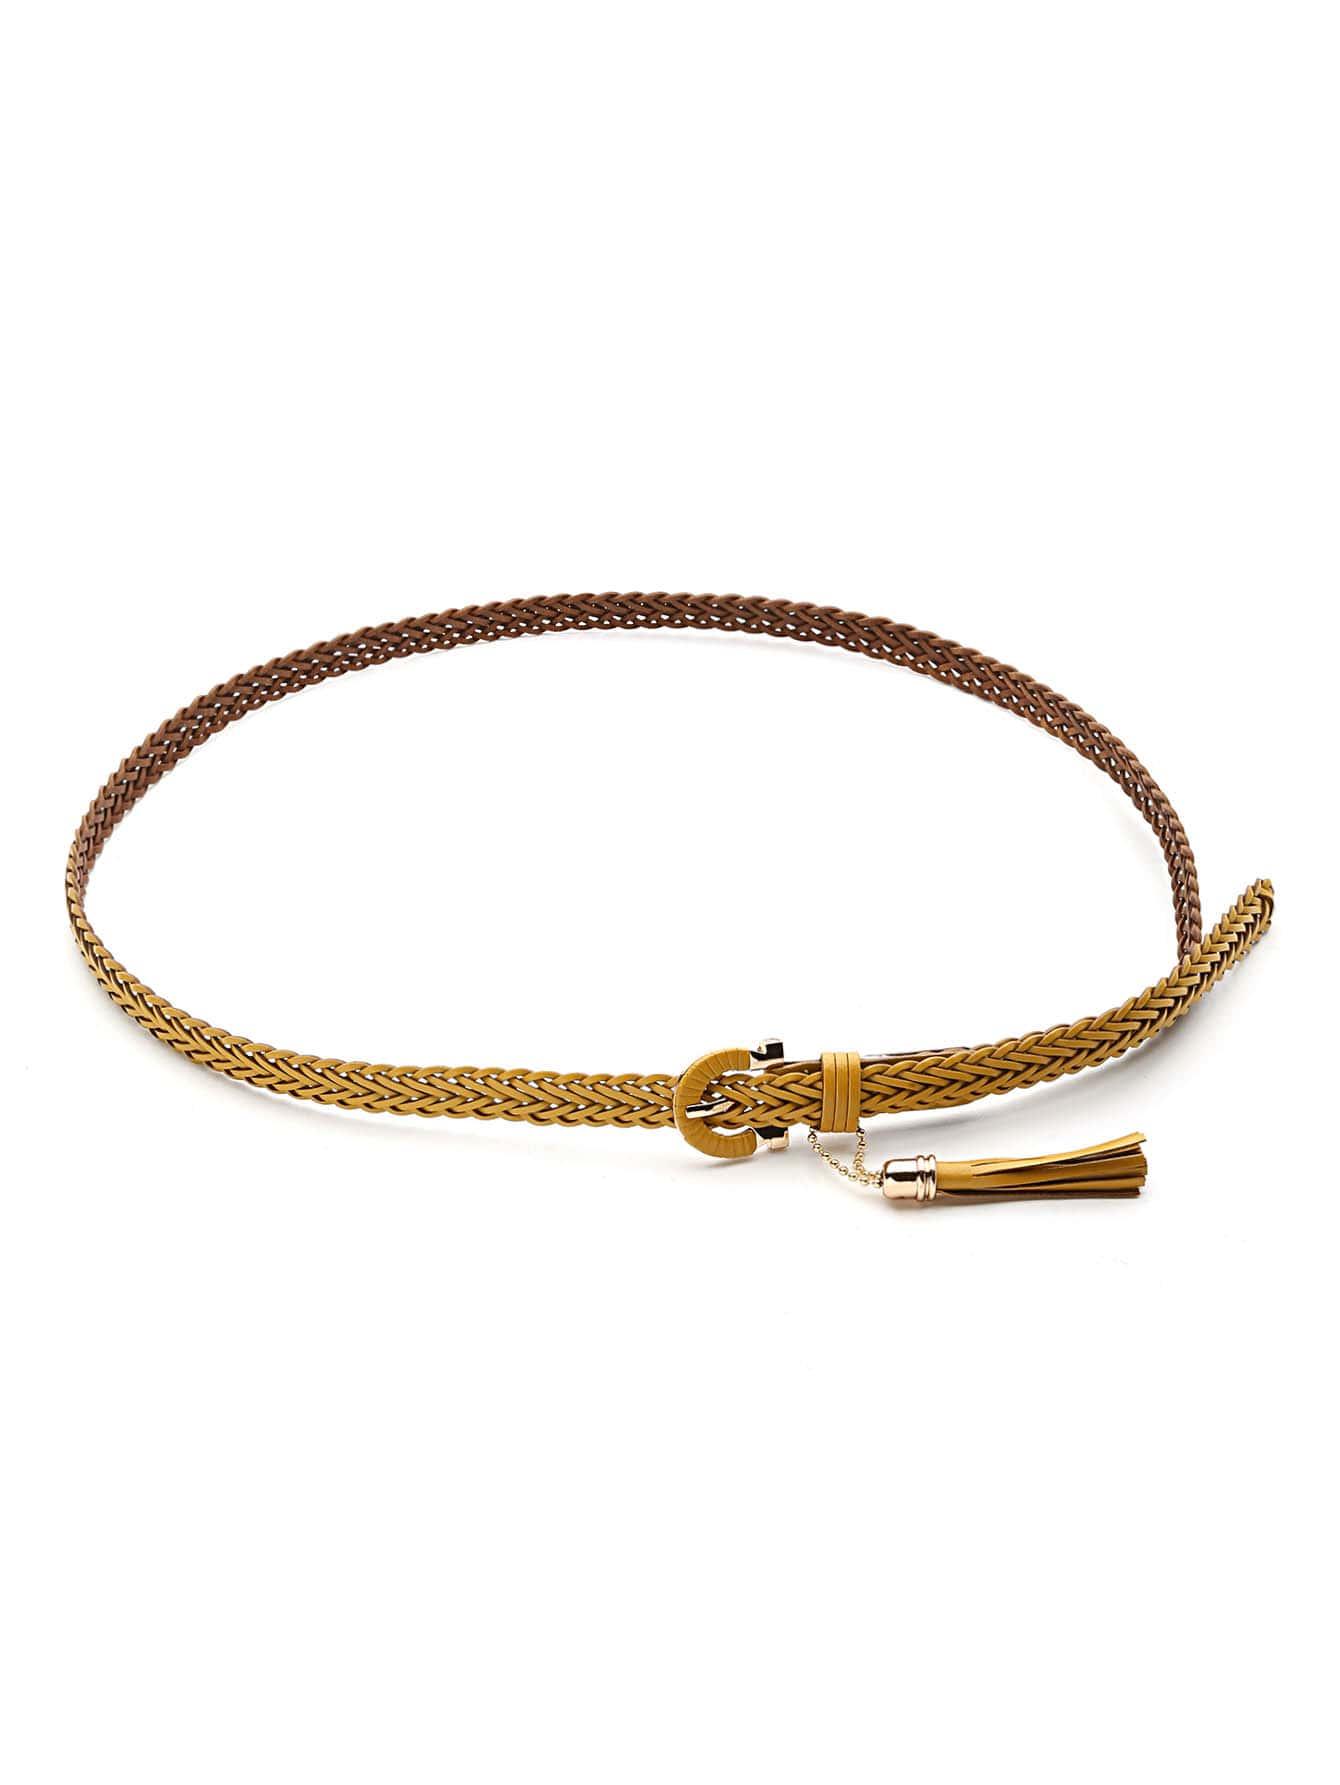 Woven Skinny Belt With Tassel